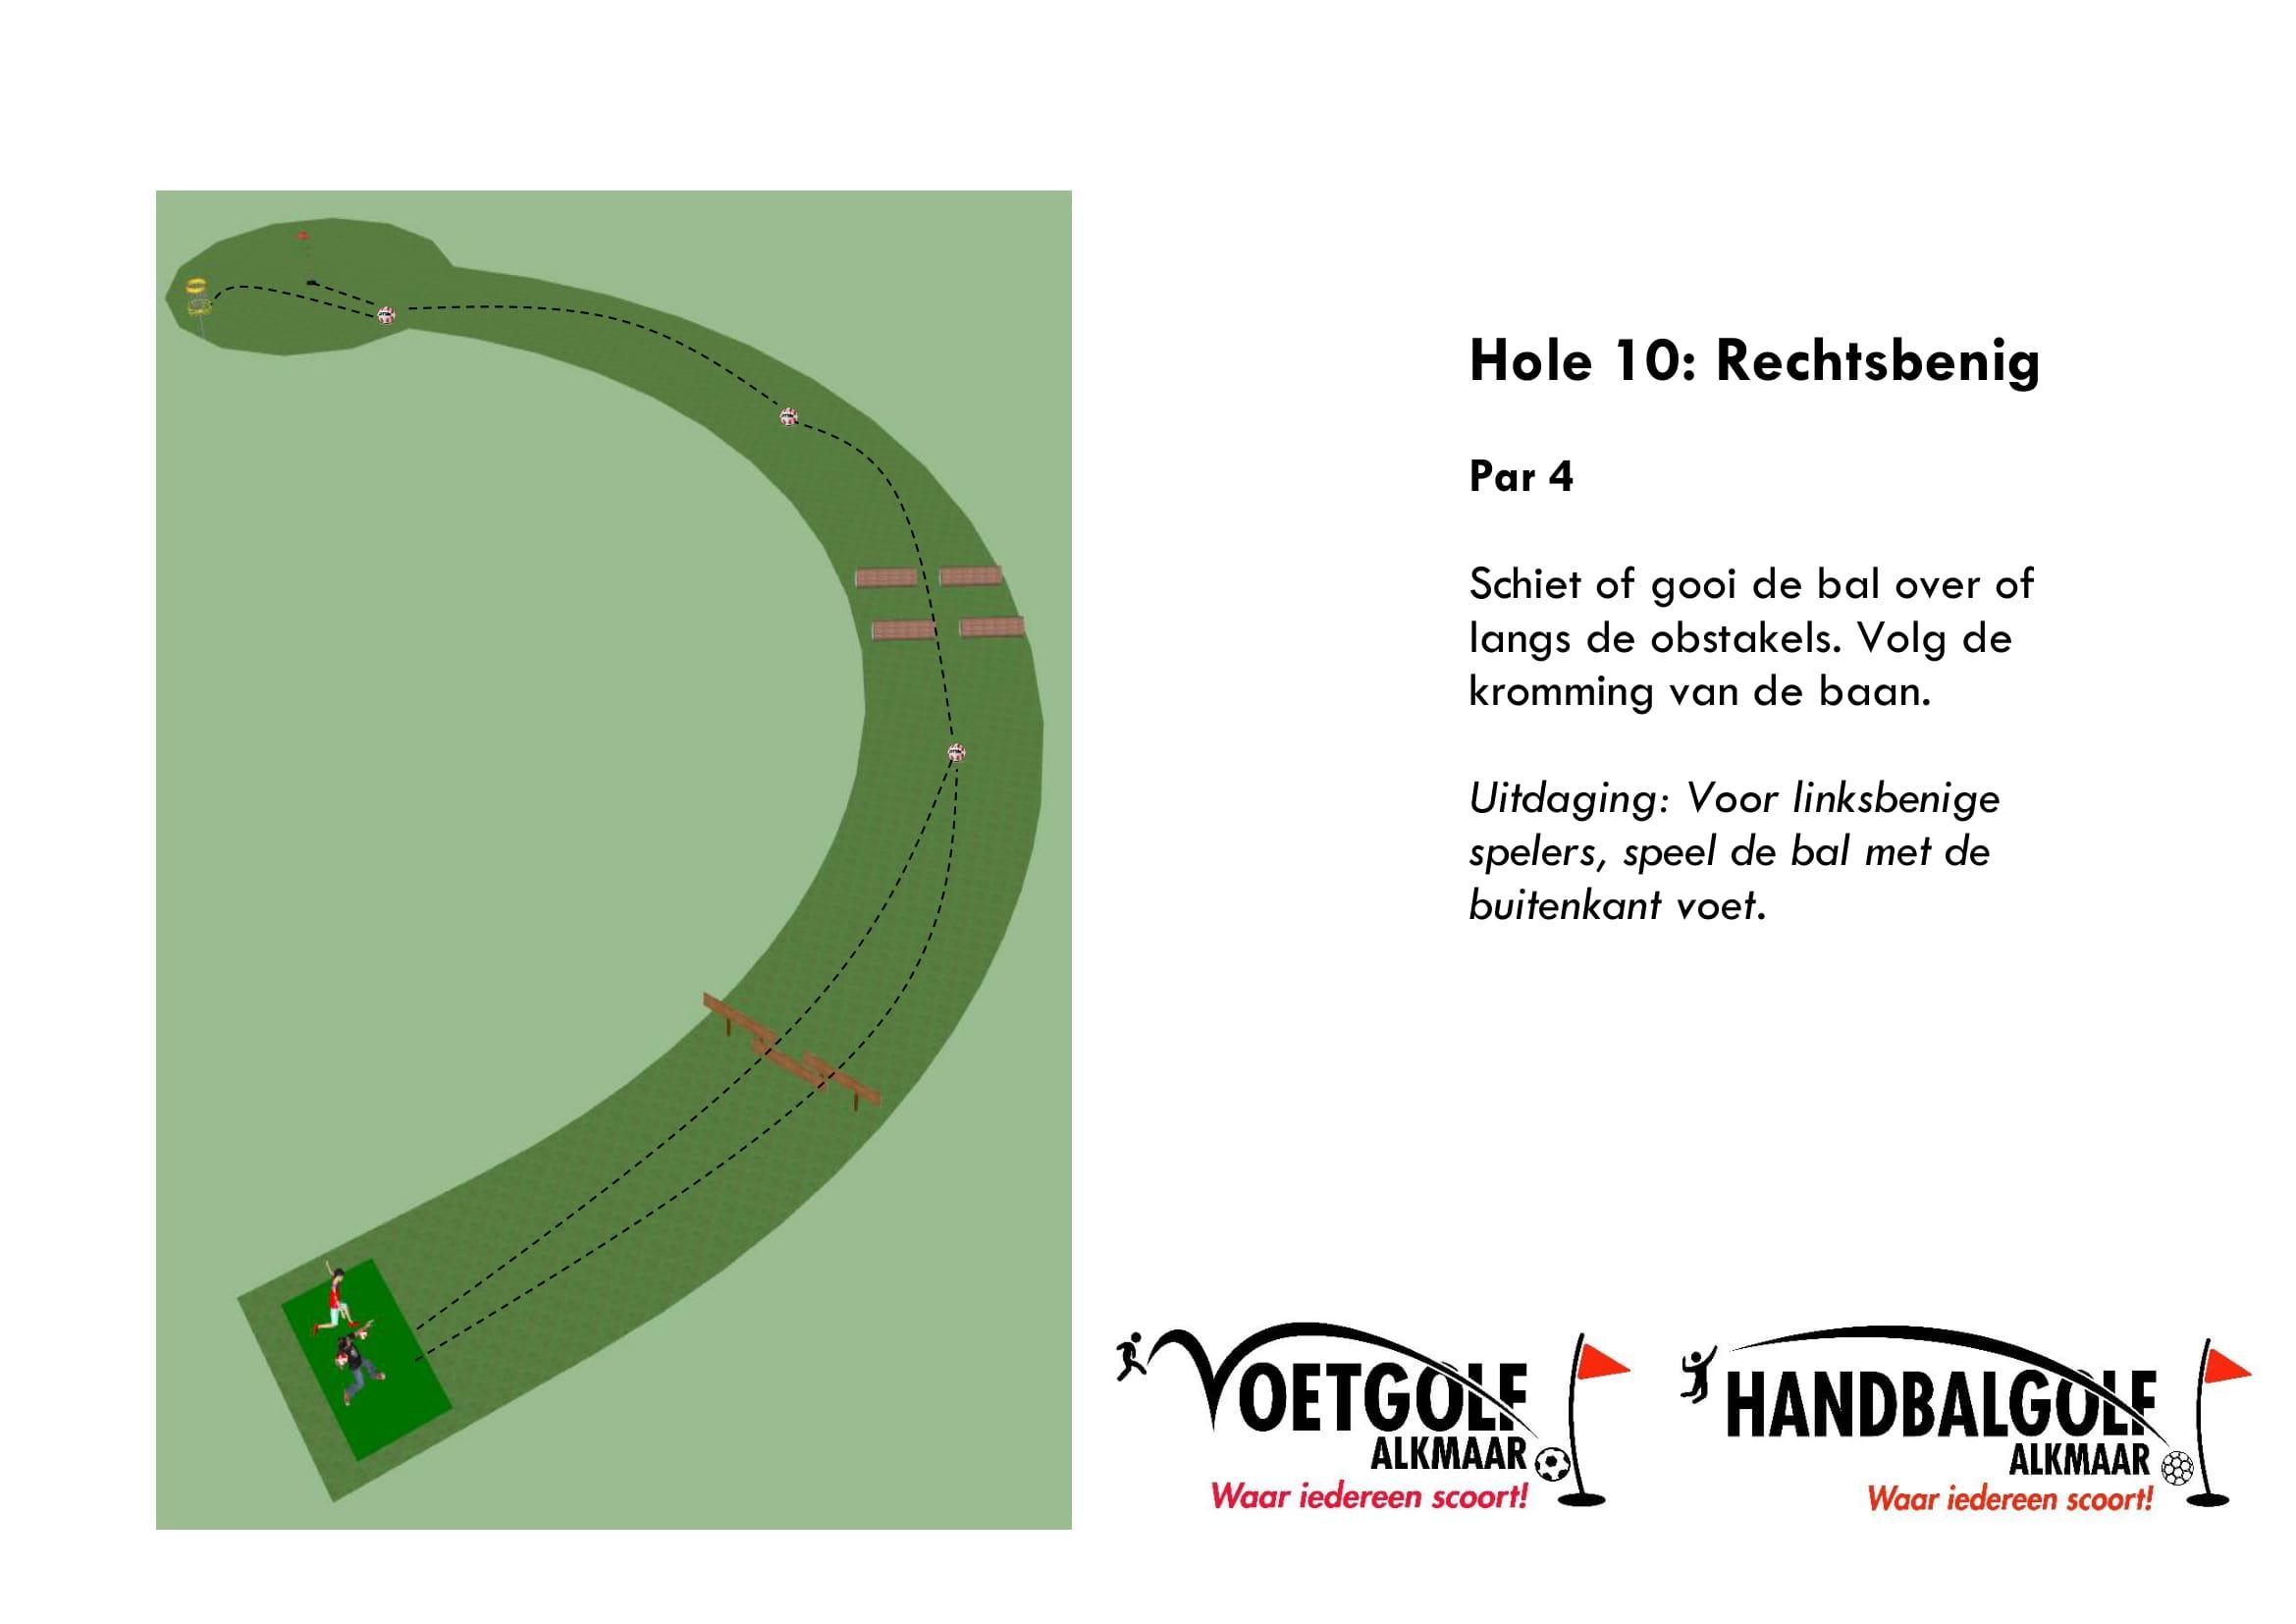 hole 10 met handbal